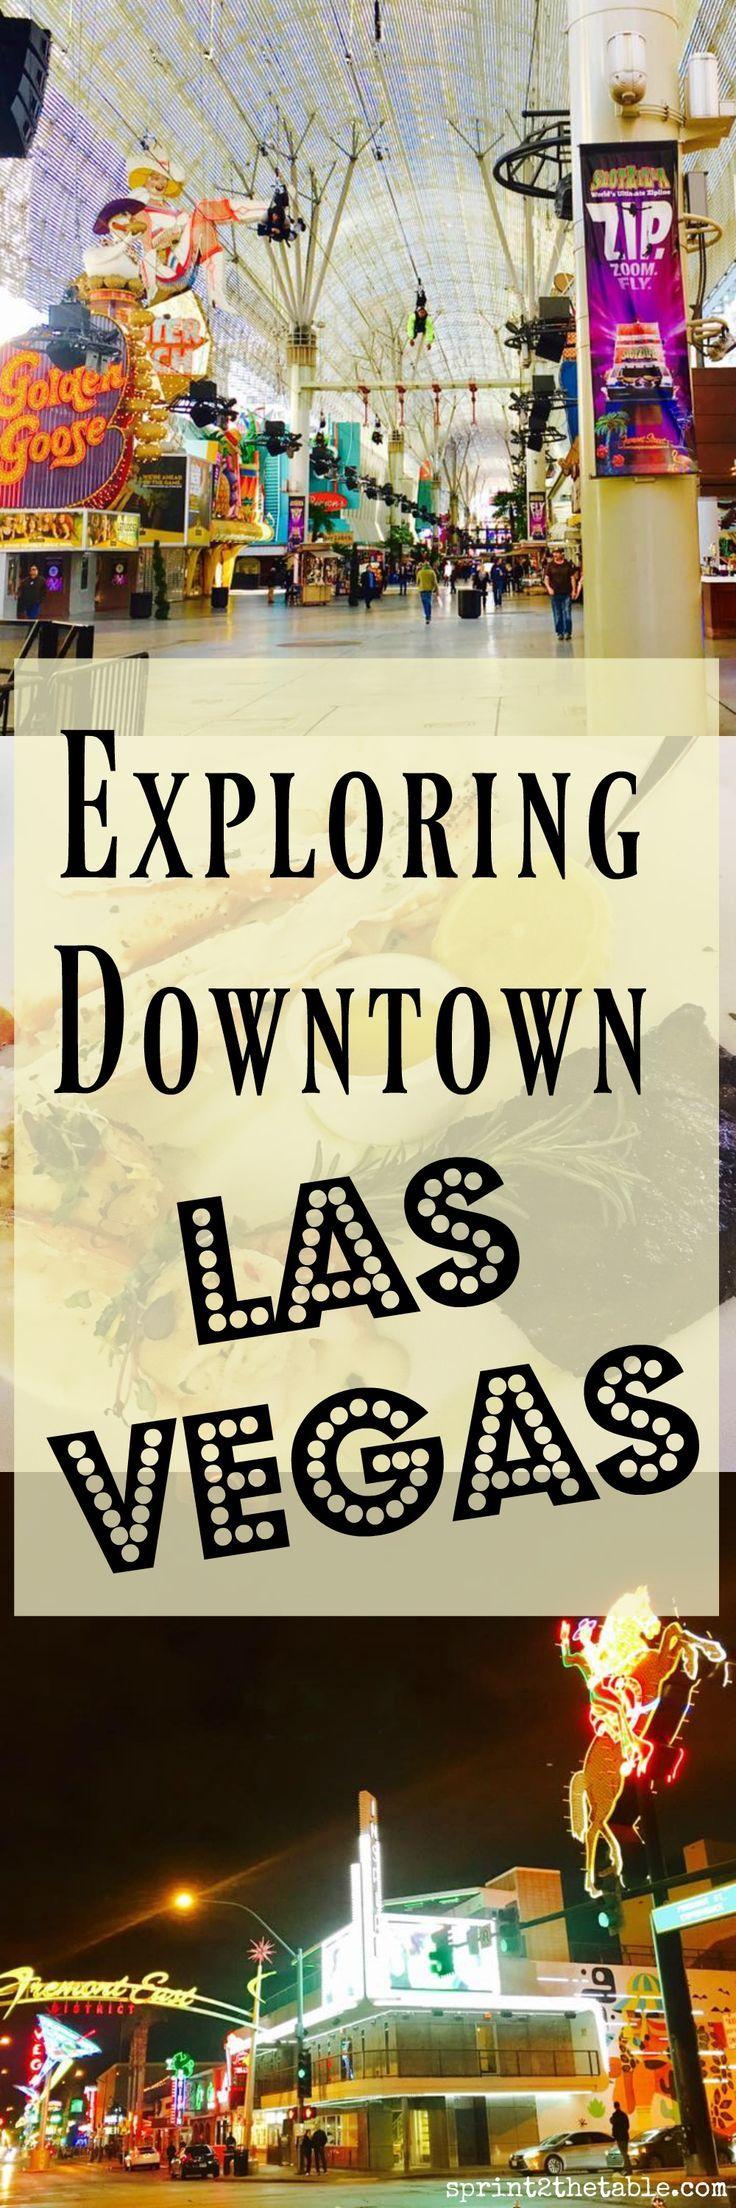 Downtown Classic Coastal Home: 1000+ Ideas About Las Vegas On Pinterest